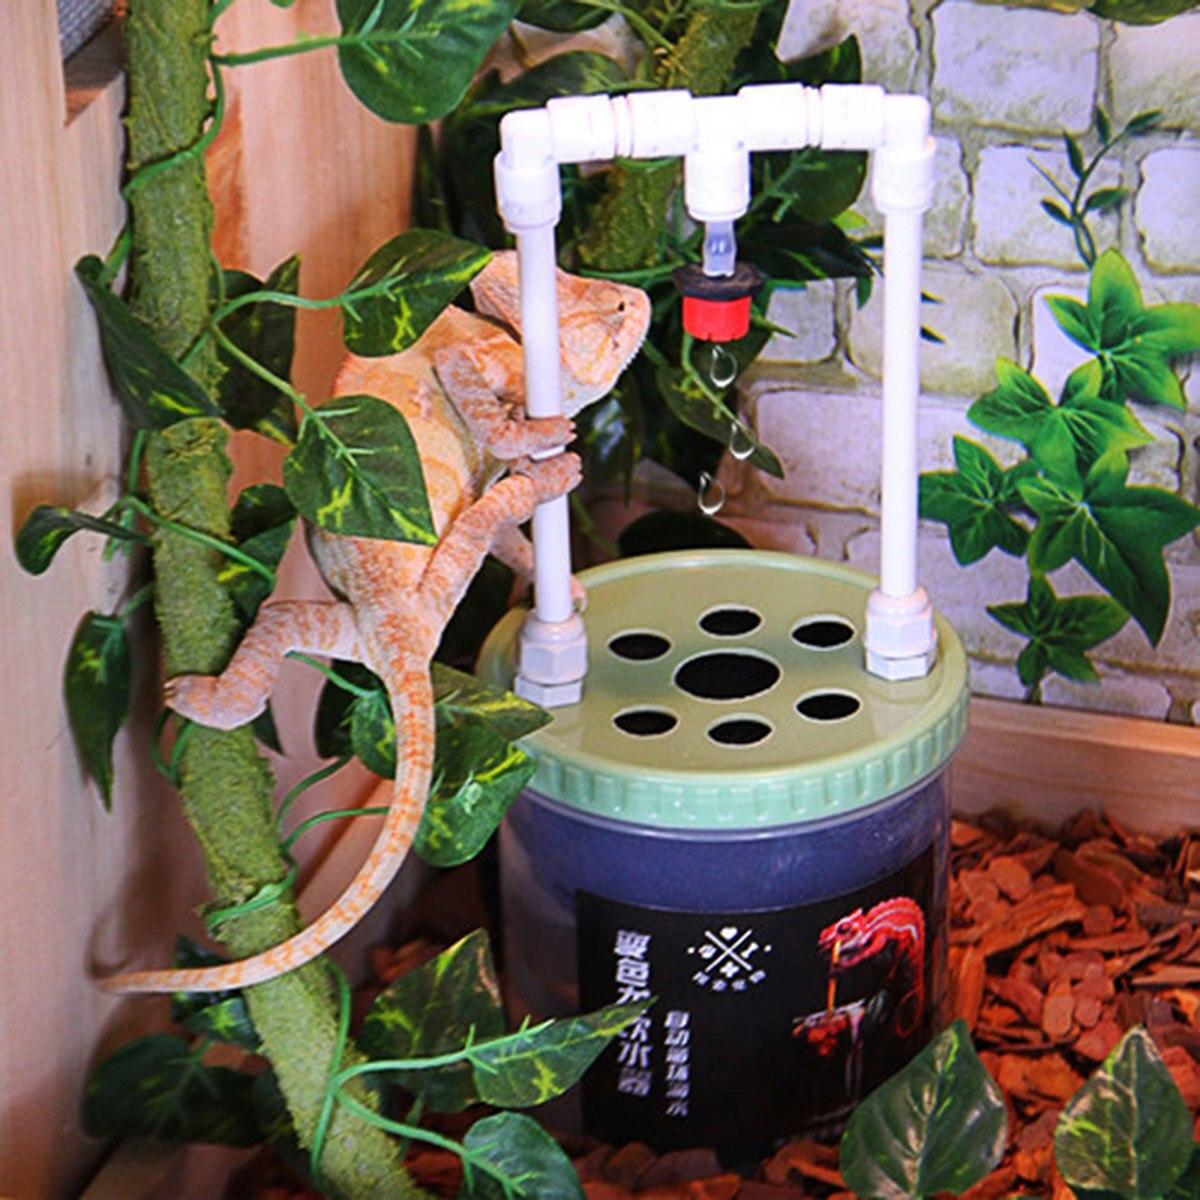 2W Reptiles Drinking Water Dripper Lizard Snake Spiders Water Dispenser Terrarium Habitats Feeding Supplies 500/700ml 220V tech 2 scanner for sale